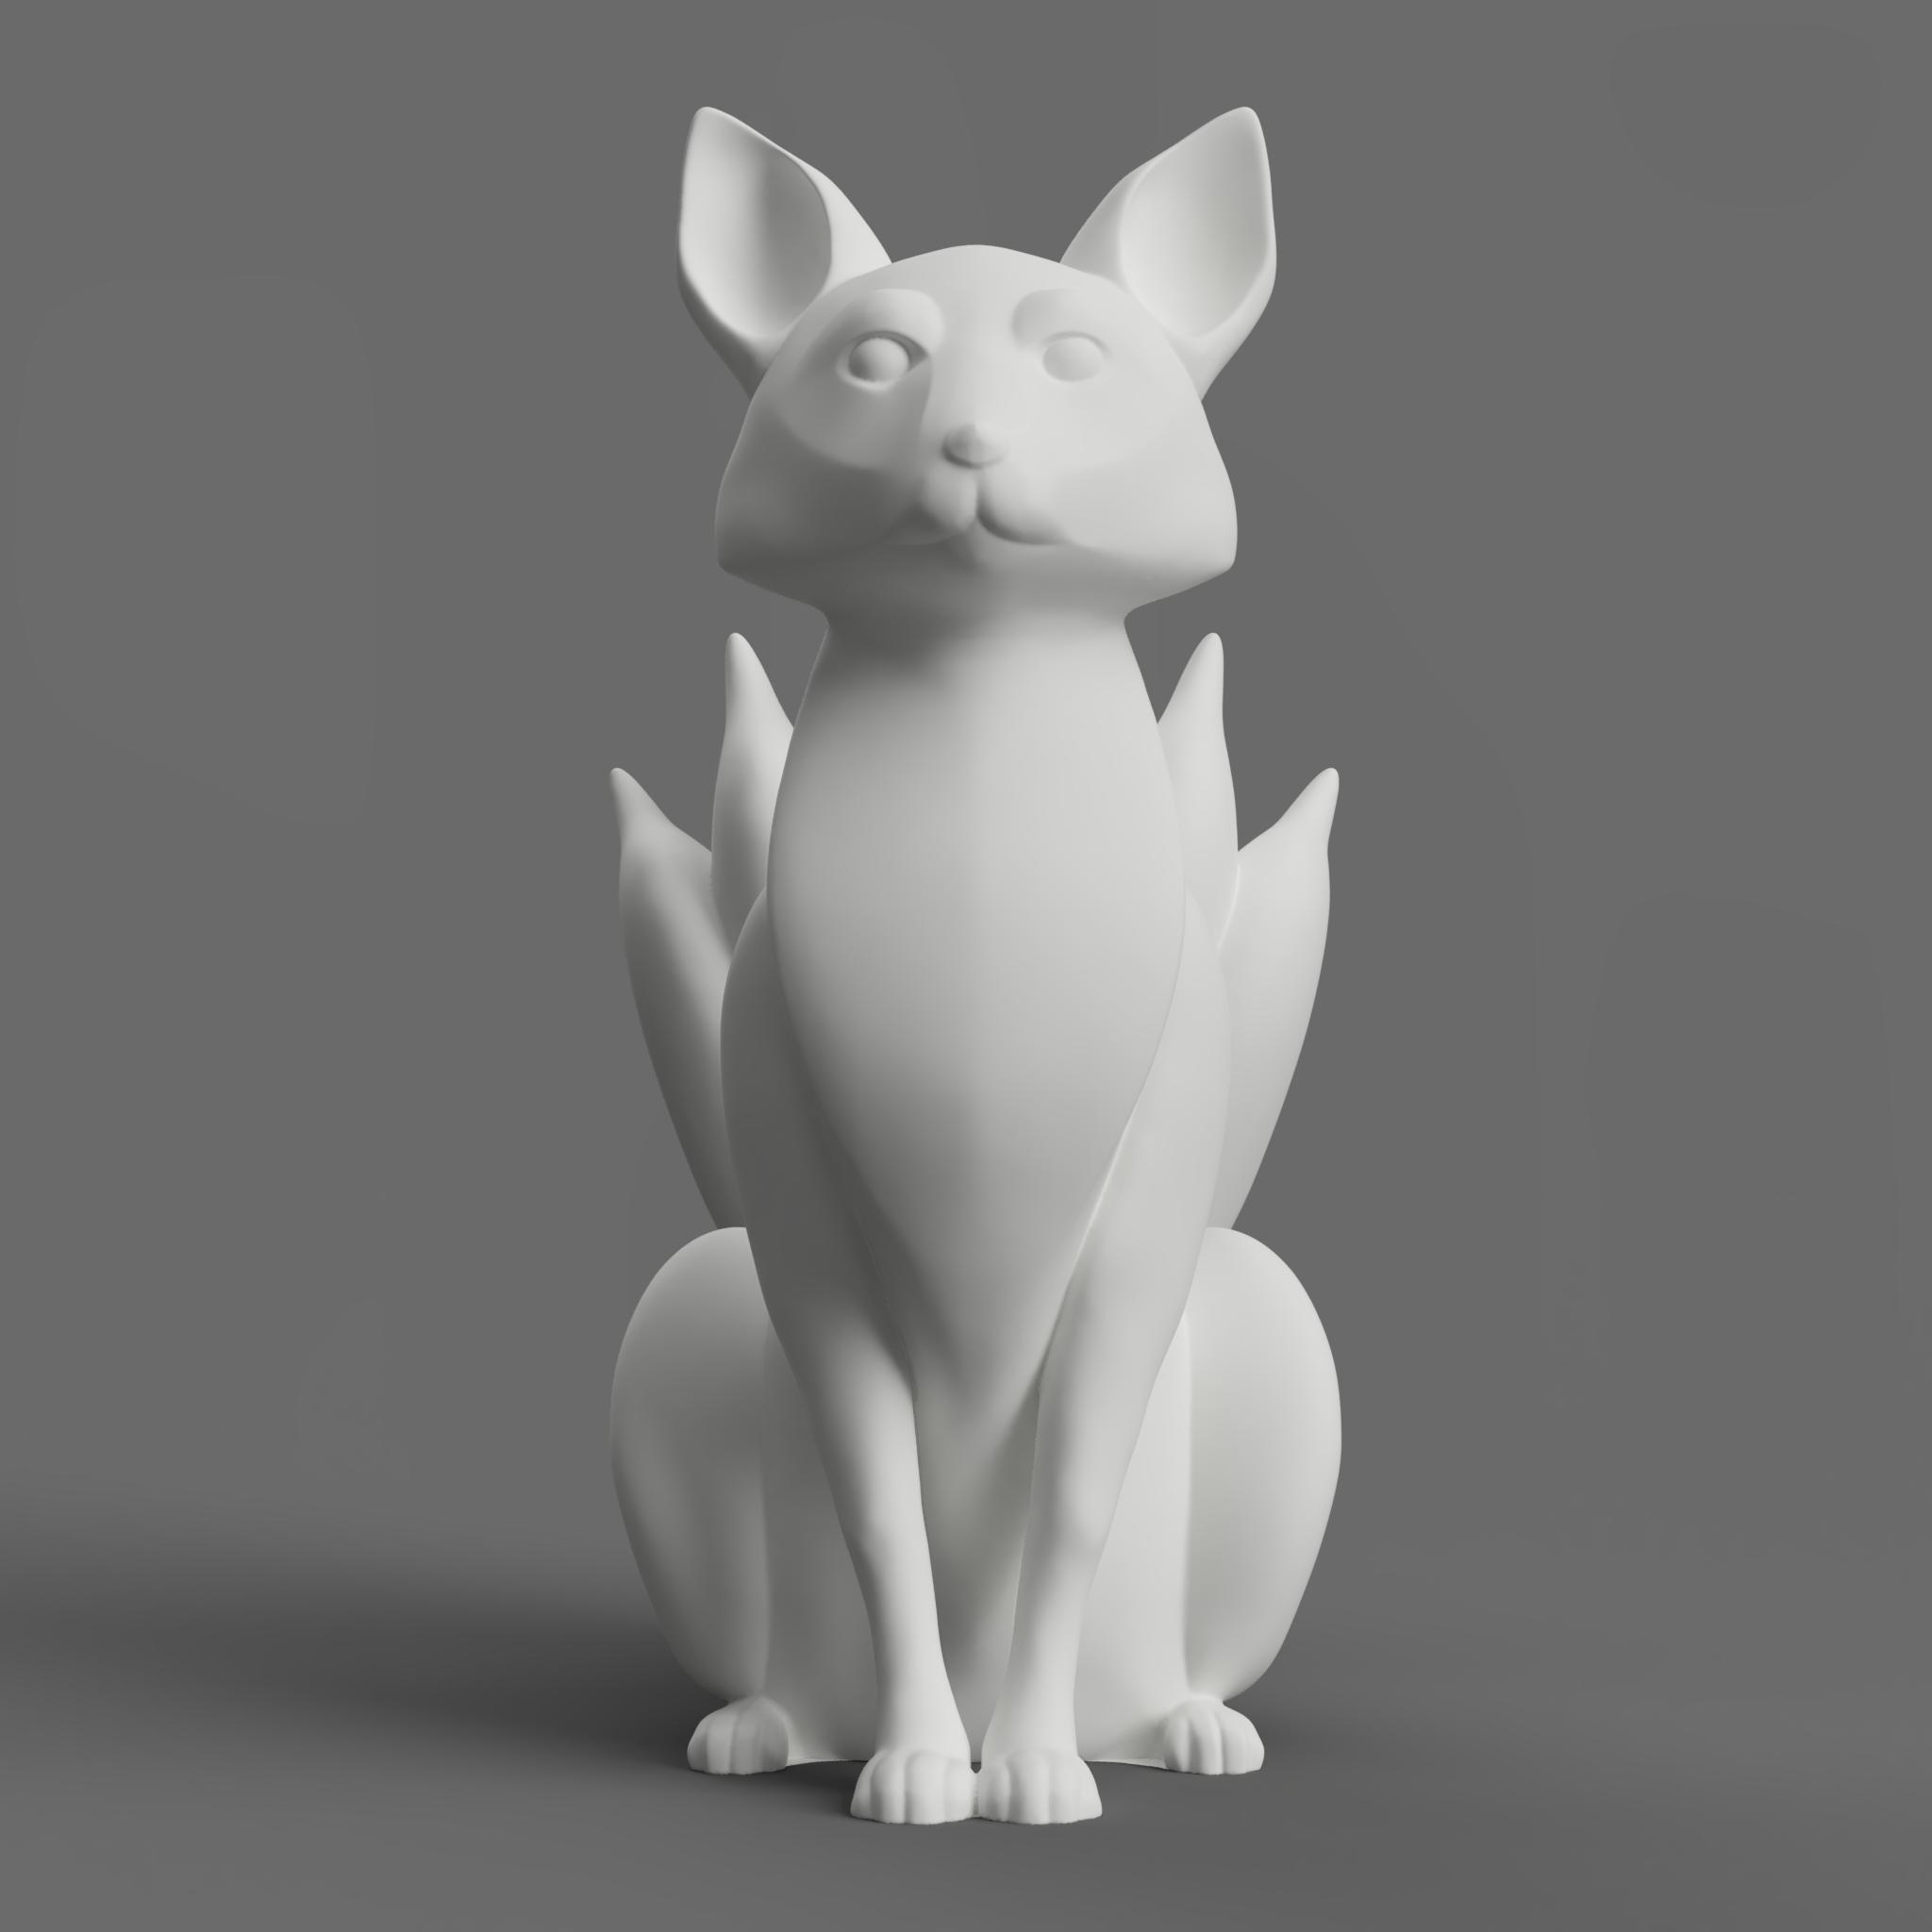 TJG_Kitsune02.png Download free STL file Kitsune - Easy Print, no supports required. New V3!!! • Design to 3D print, ThatJoshGuy